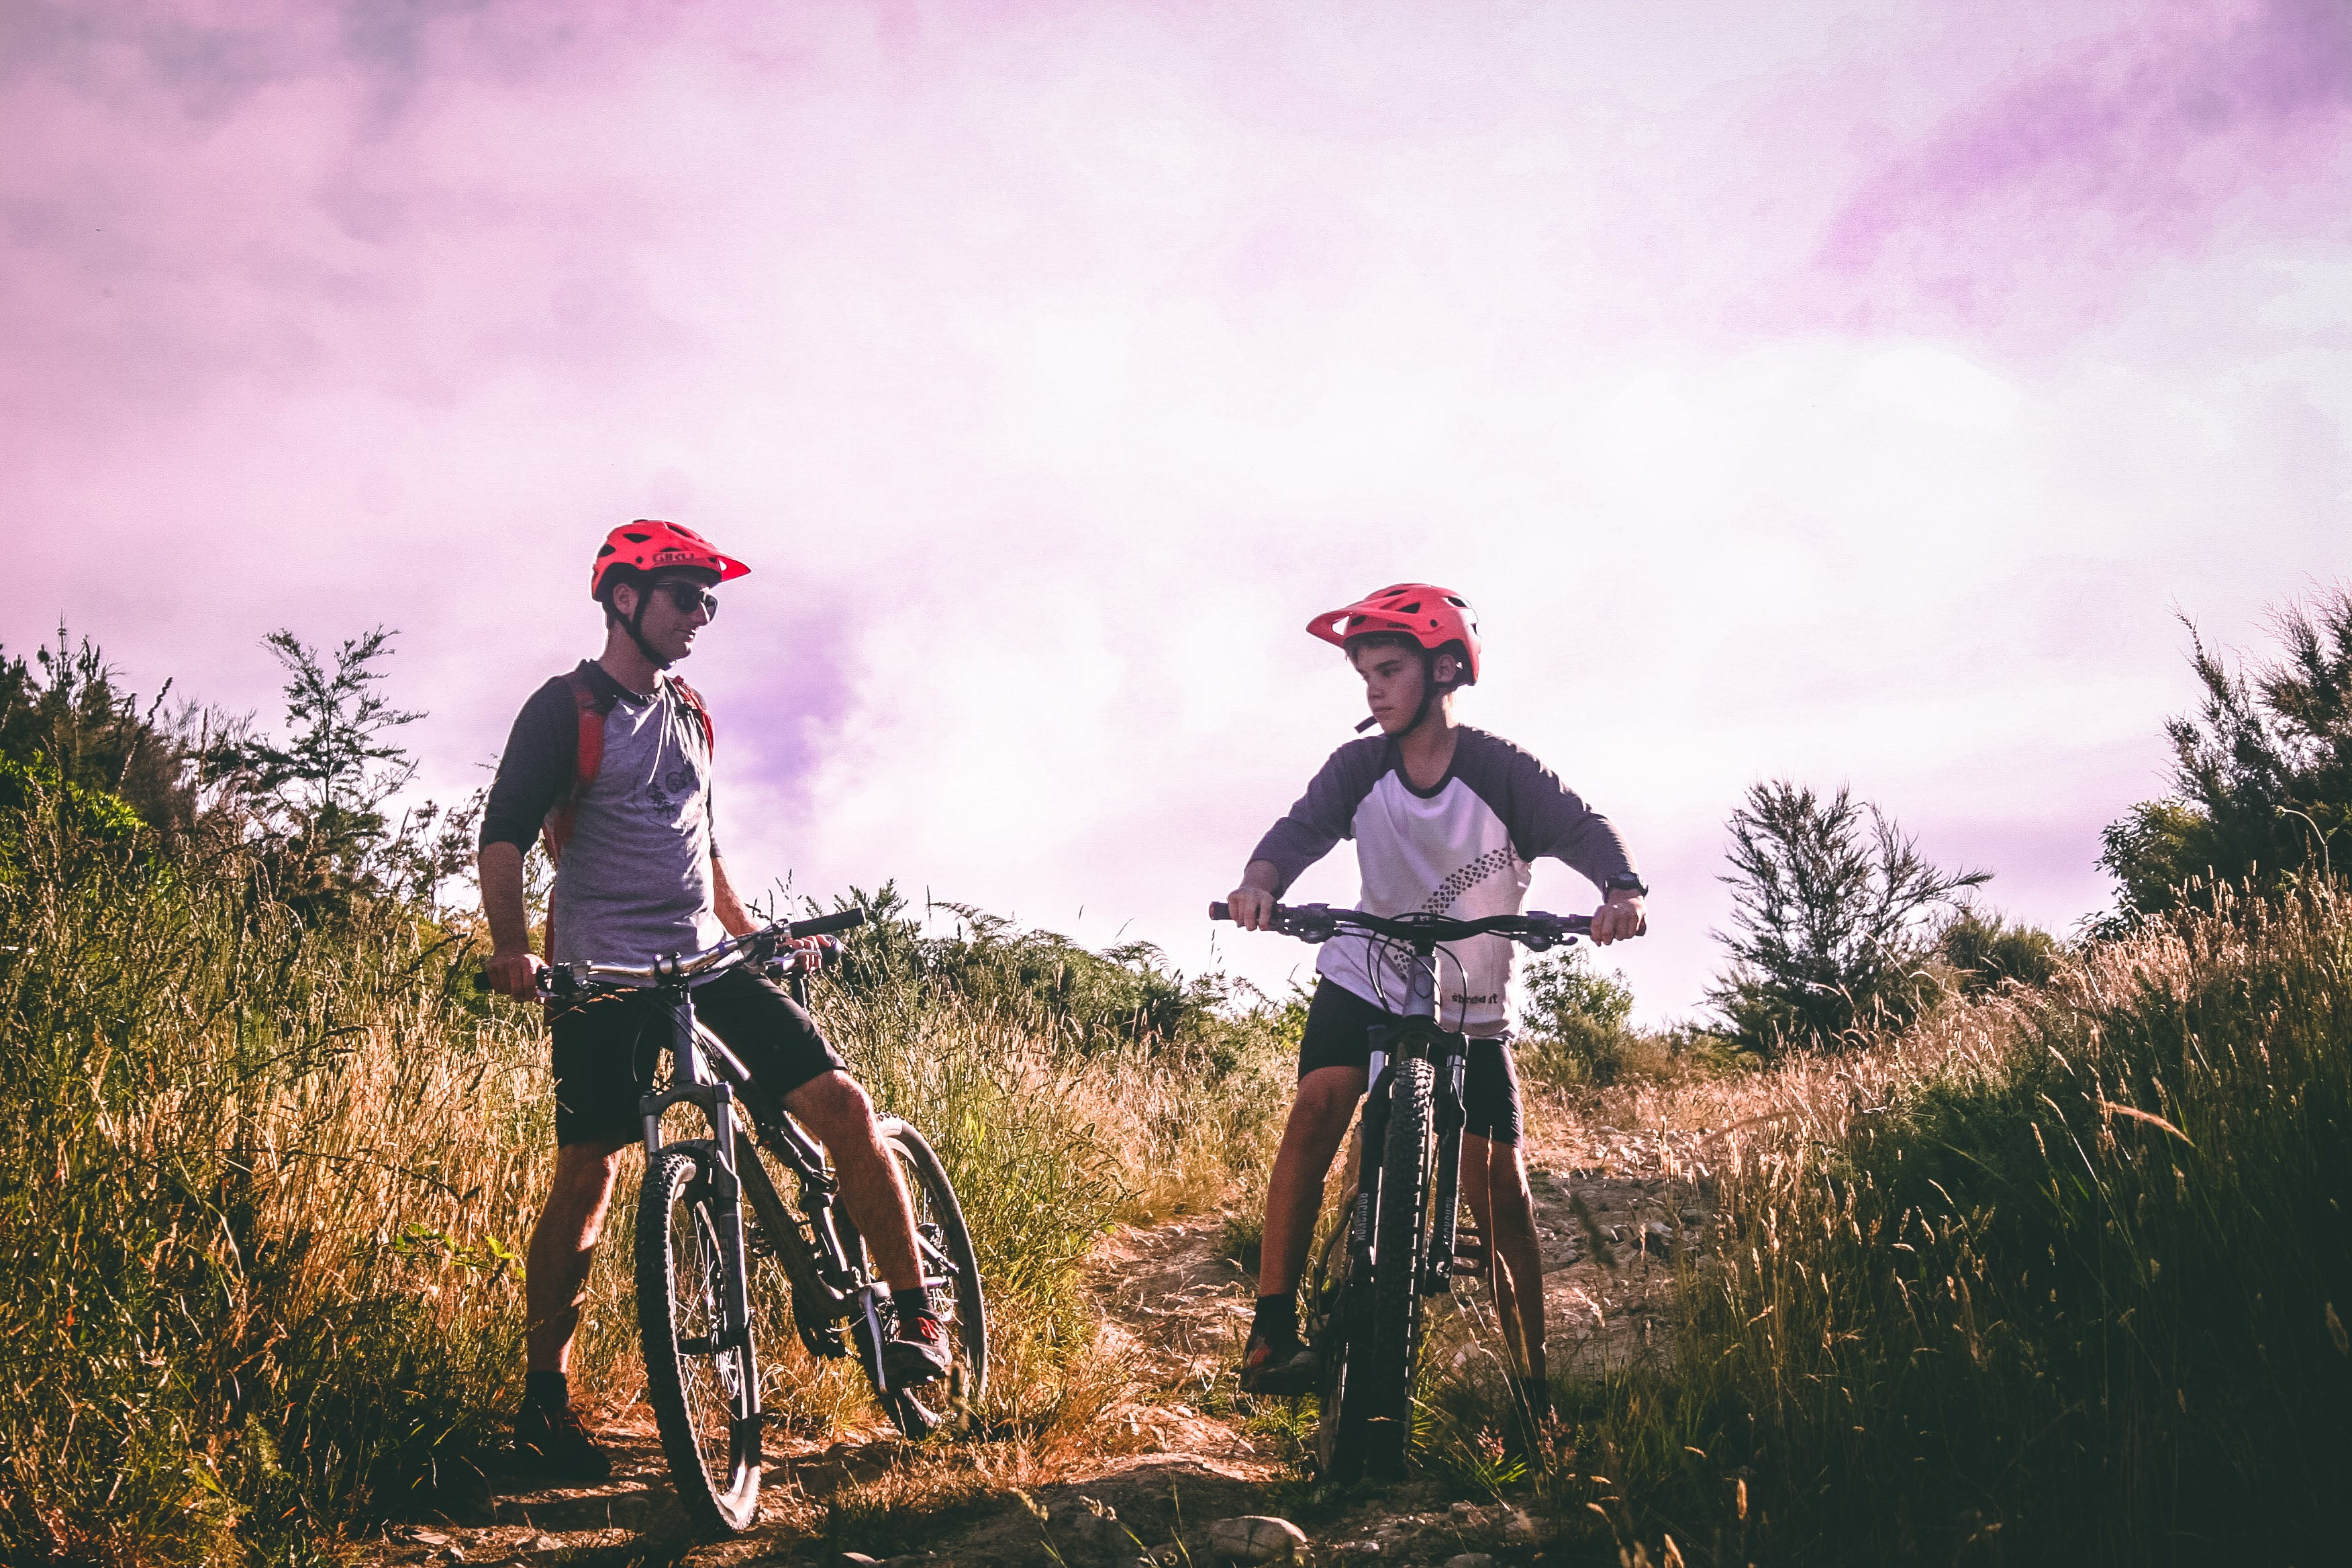 Fotos de stock gratuitas de adolescente, adulto, aventura, bicicletas de montaña